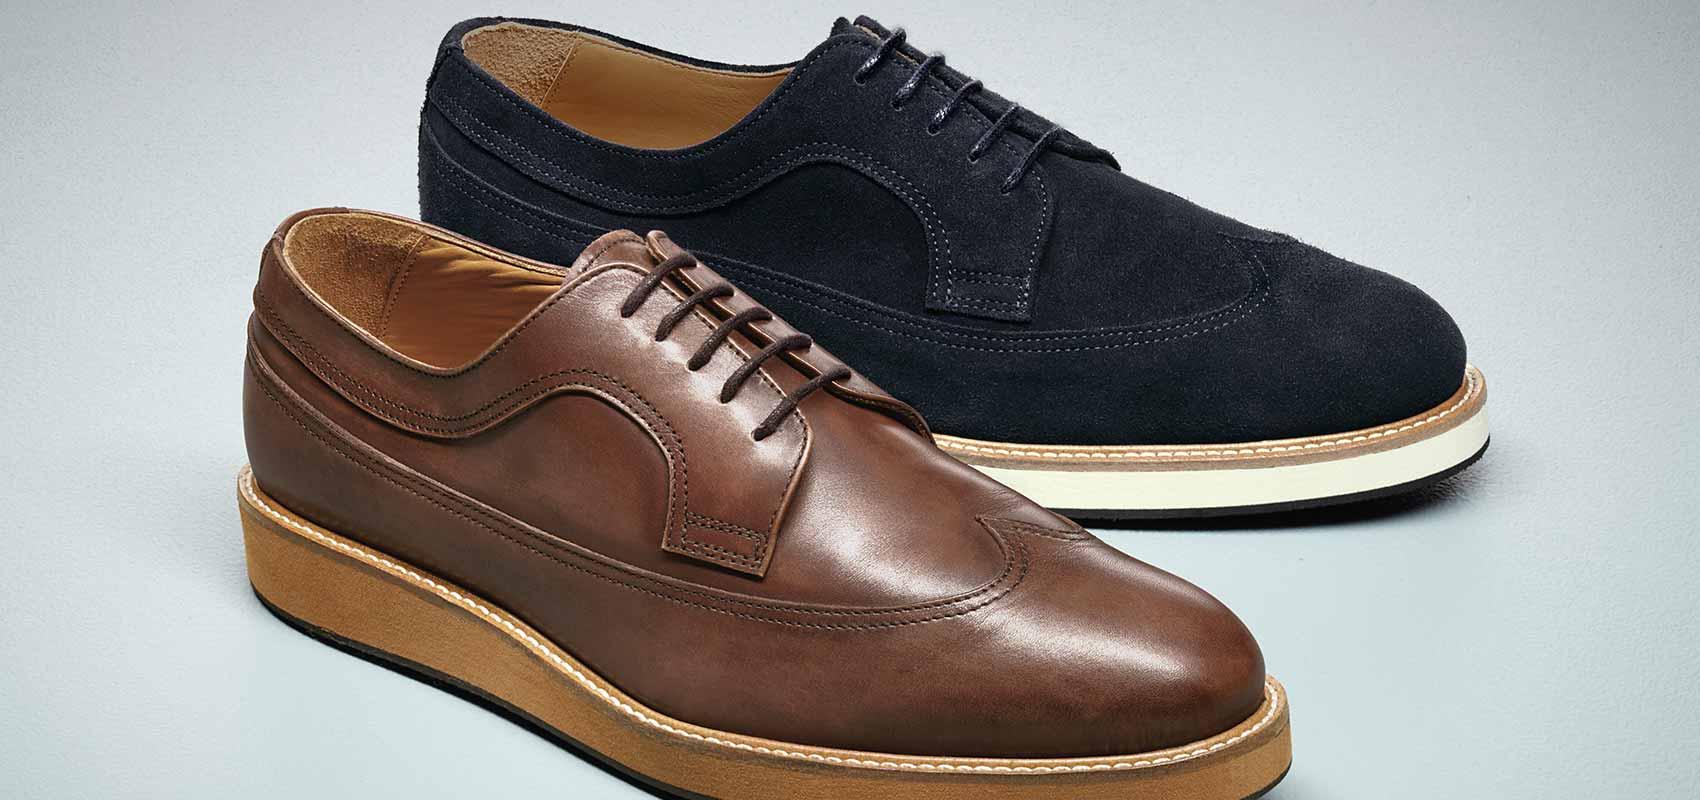 Charles Tyrwhitt Derby-Schuhe